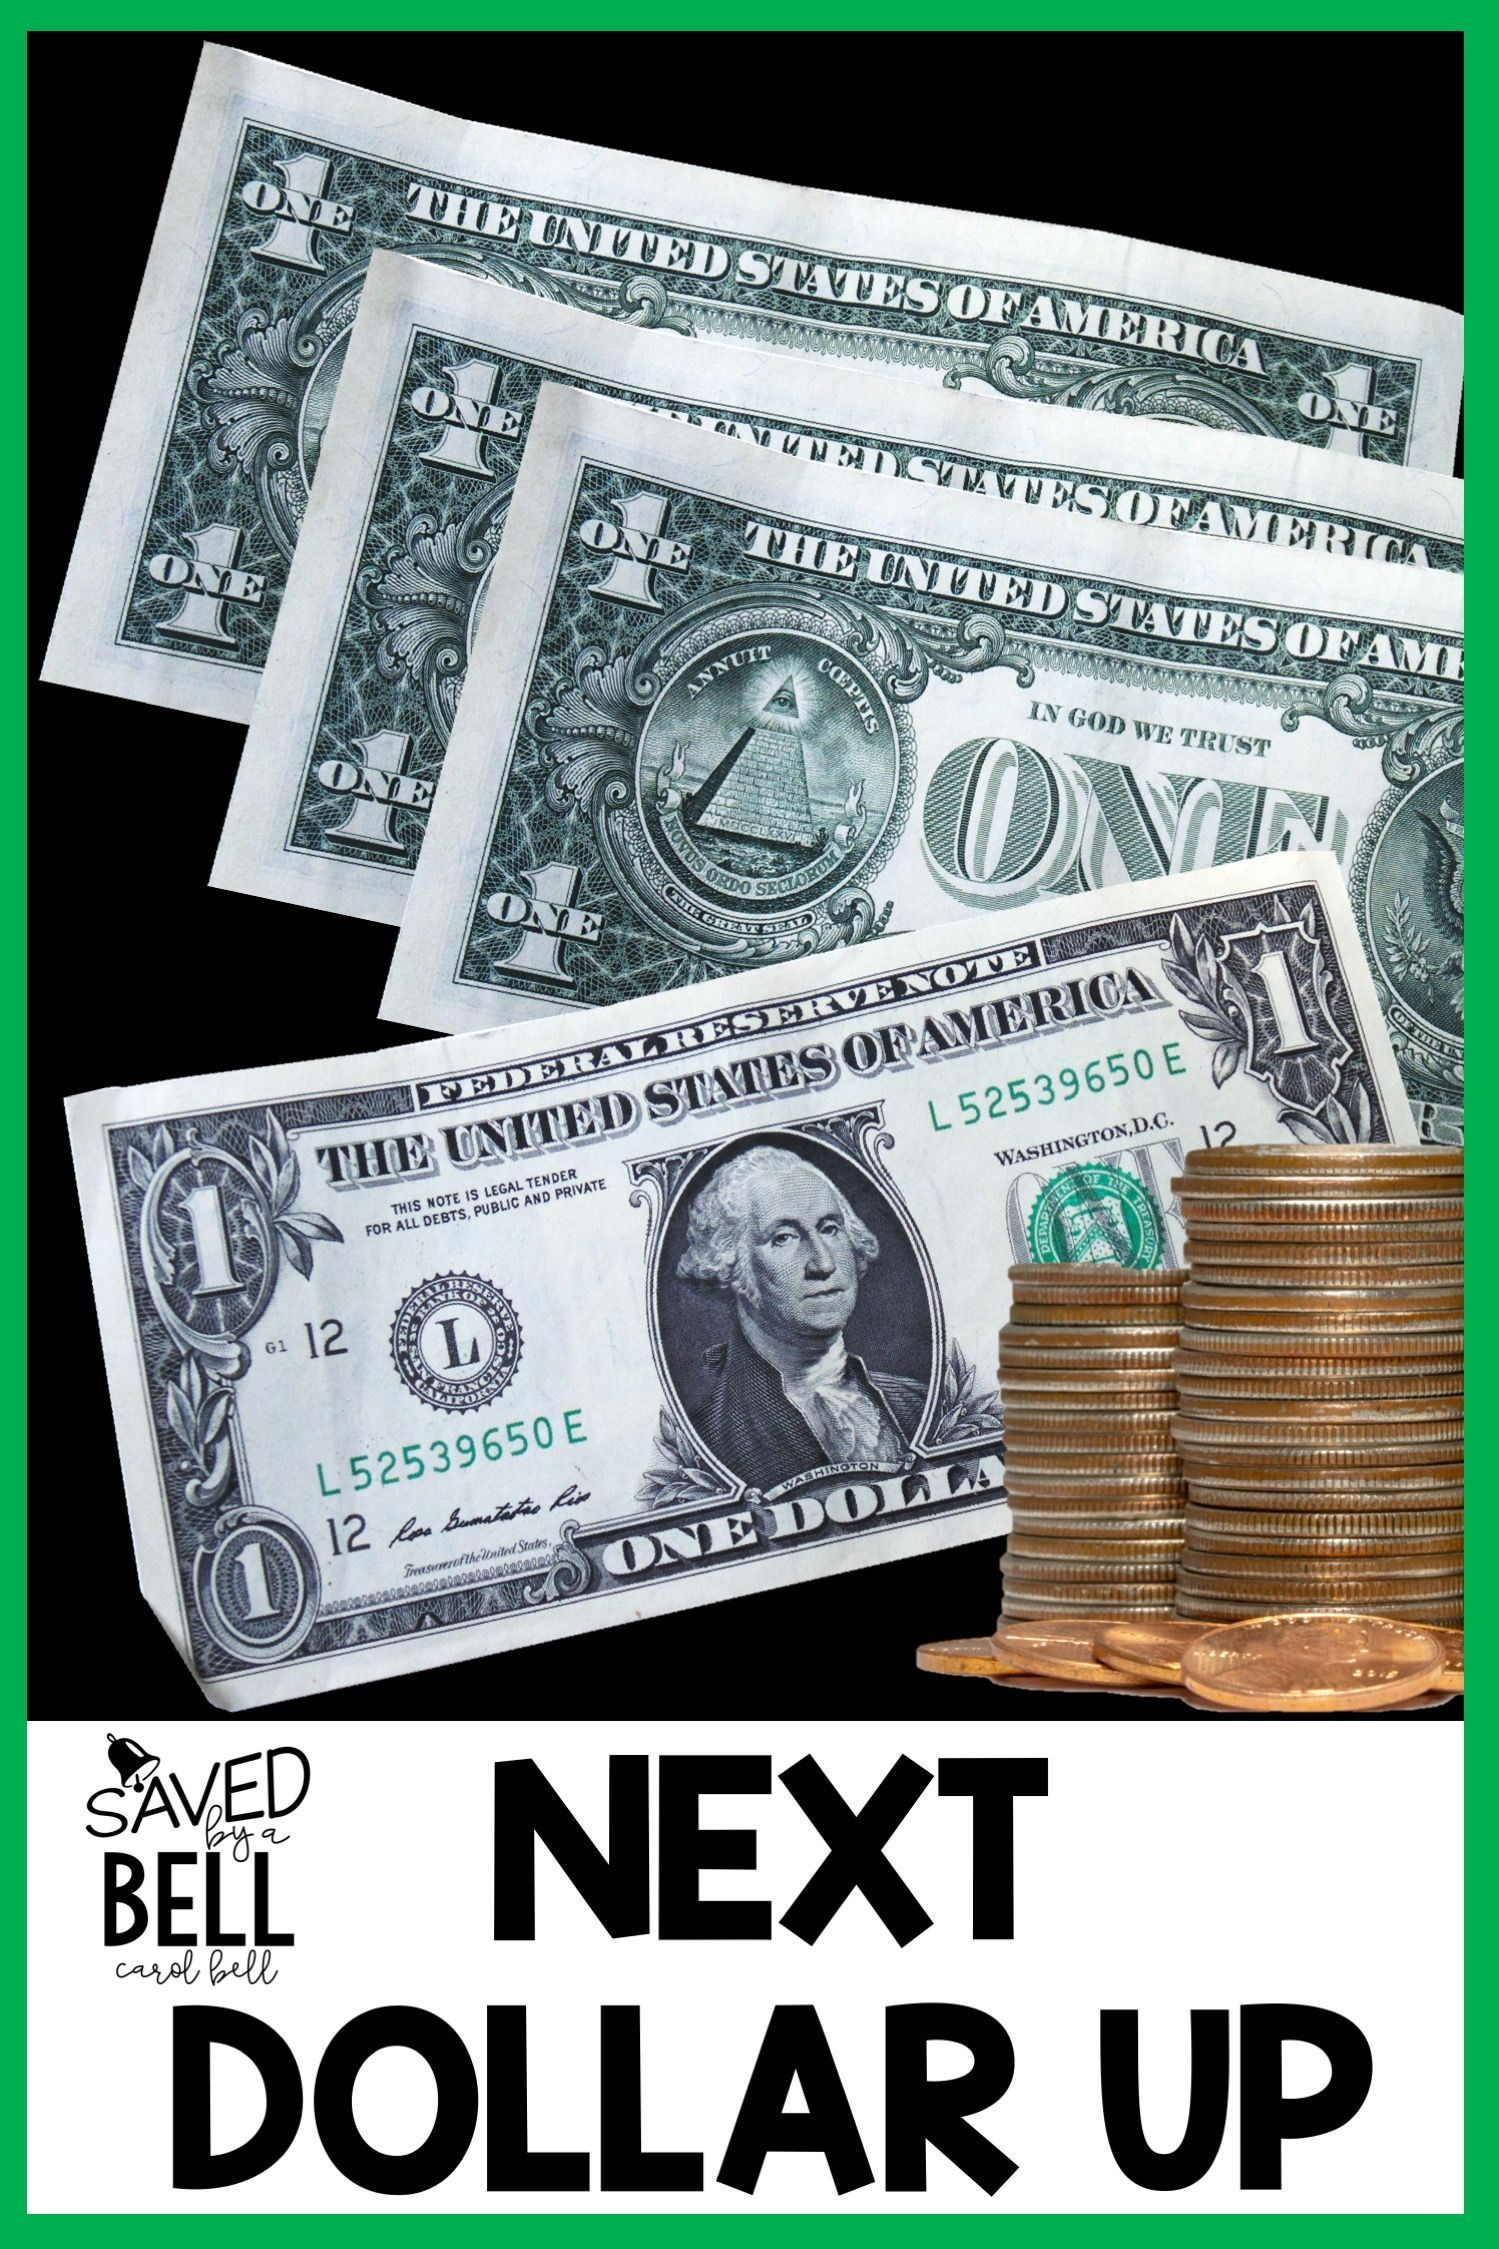 Next Dollar Up Worksheets and Word Problems Menu Math menu math worksheets